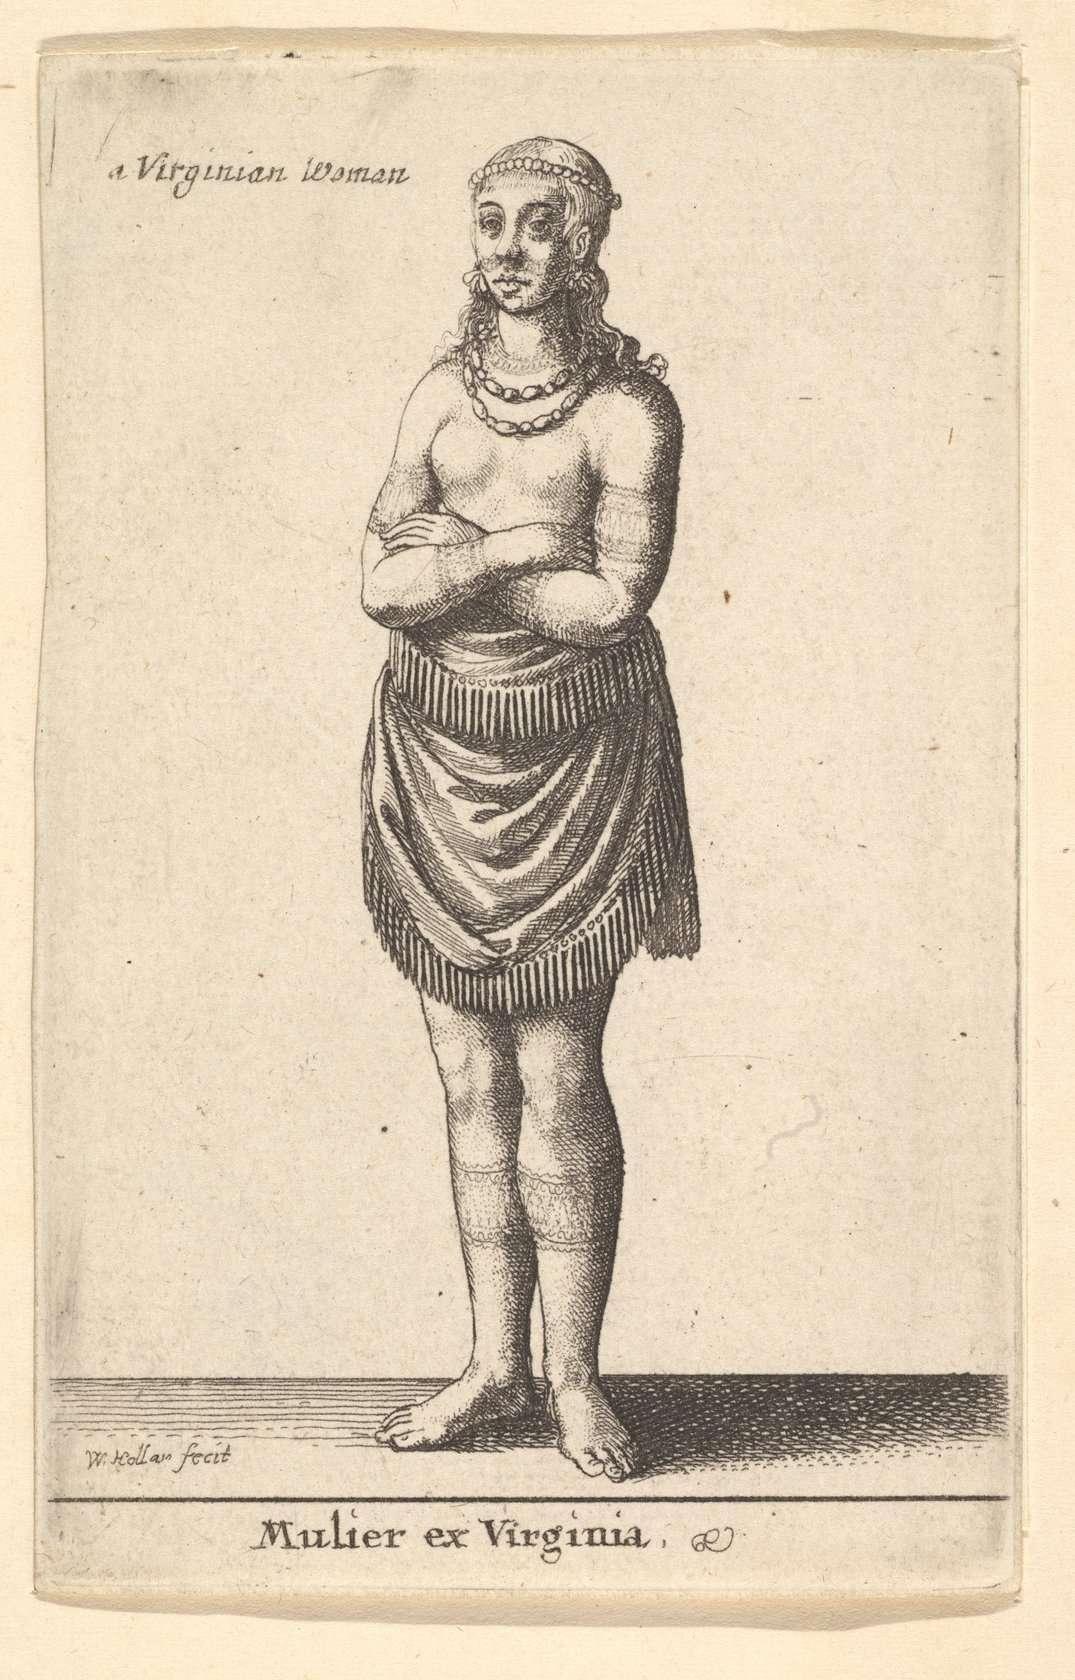 A Virginian Woman [Mulier ex Virginia]